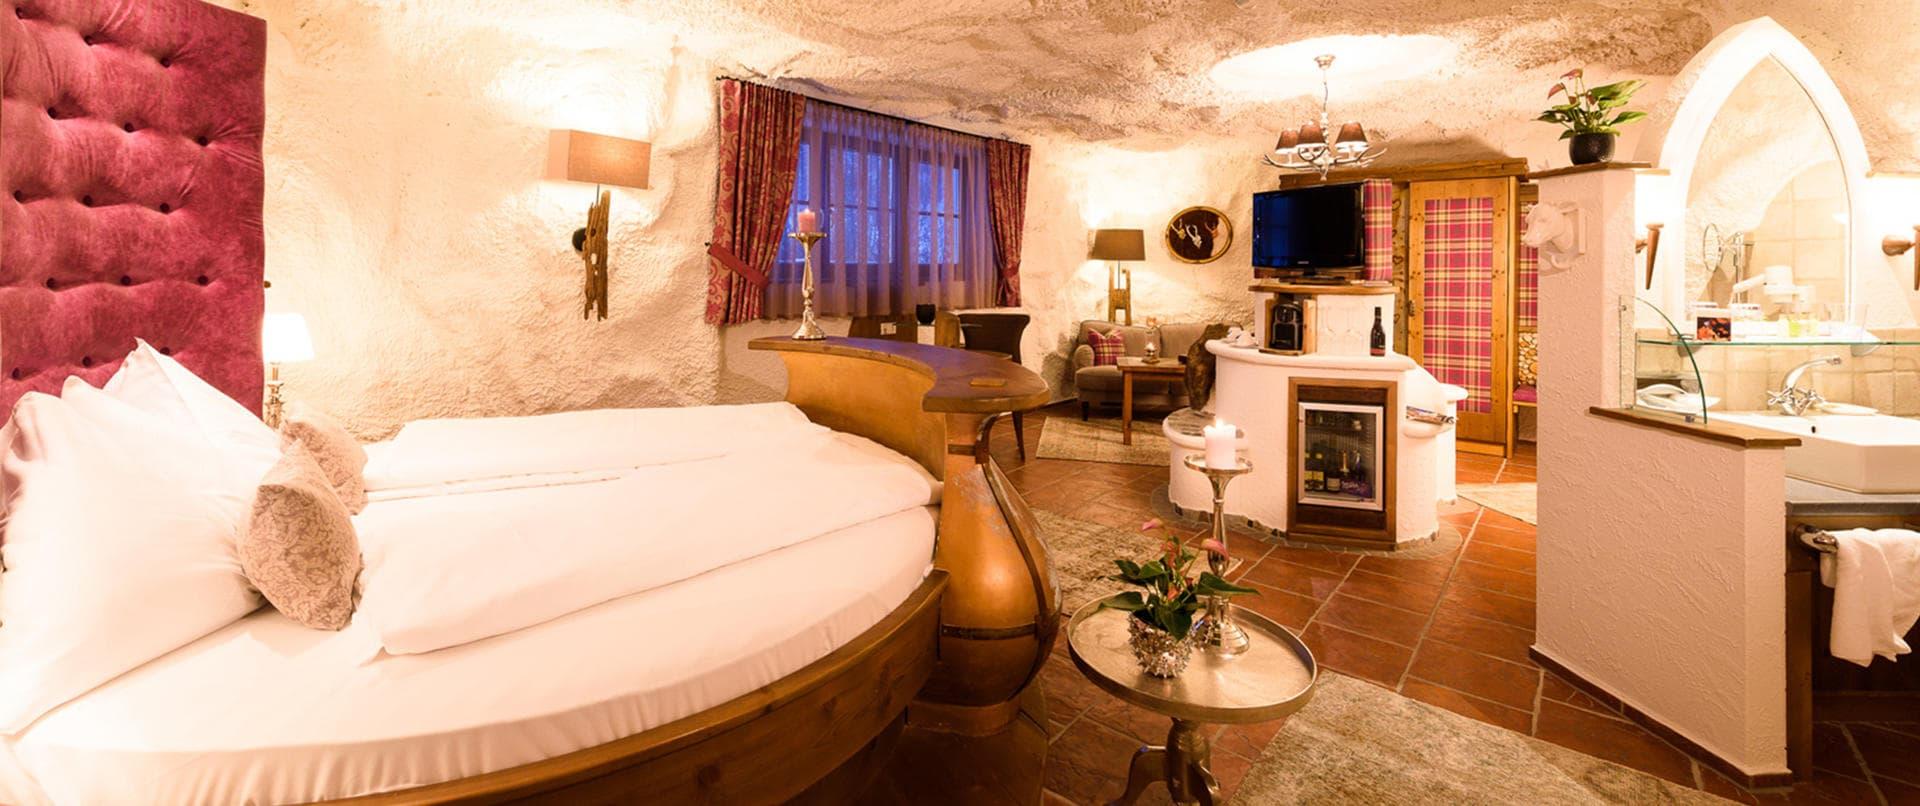 Wildromantik Suite Hotel Bergergut S Loveness Genusshotel